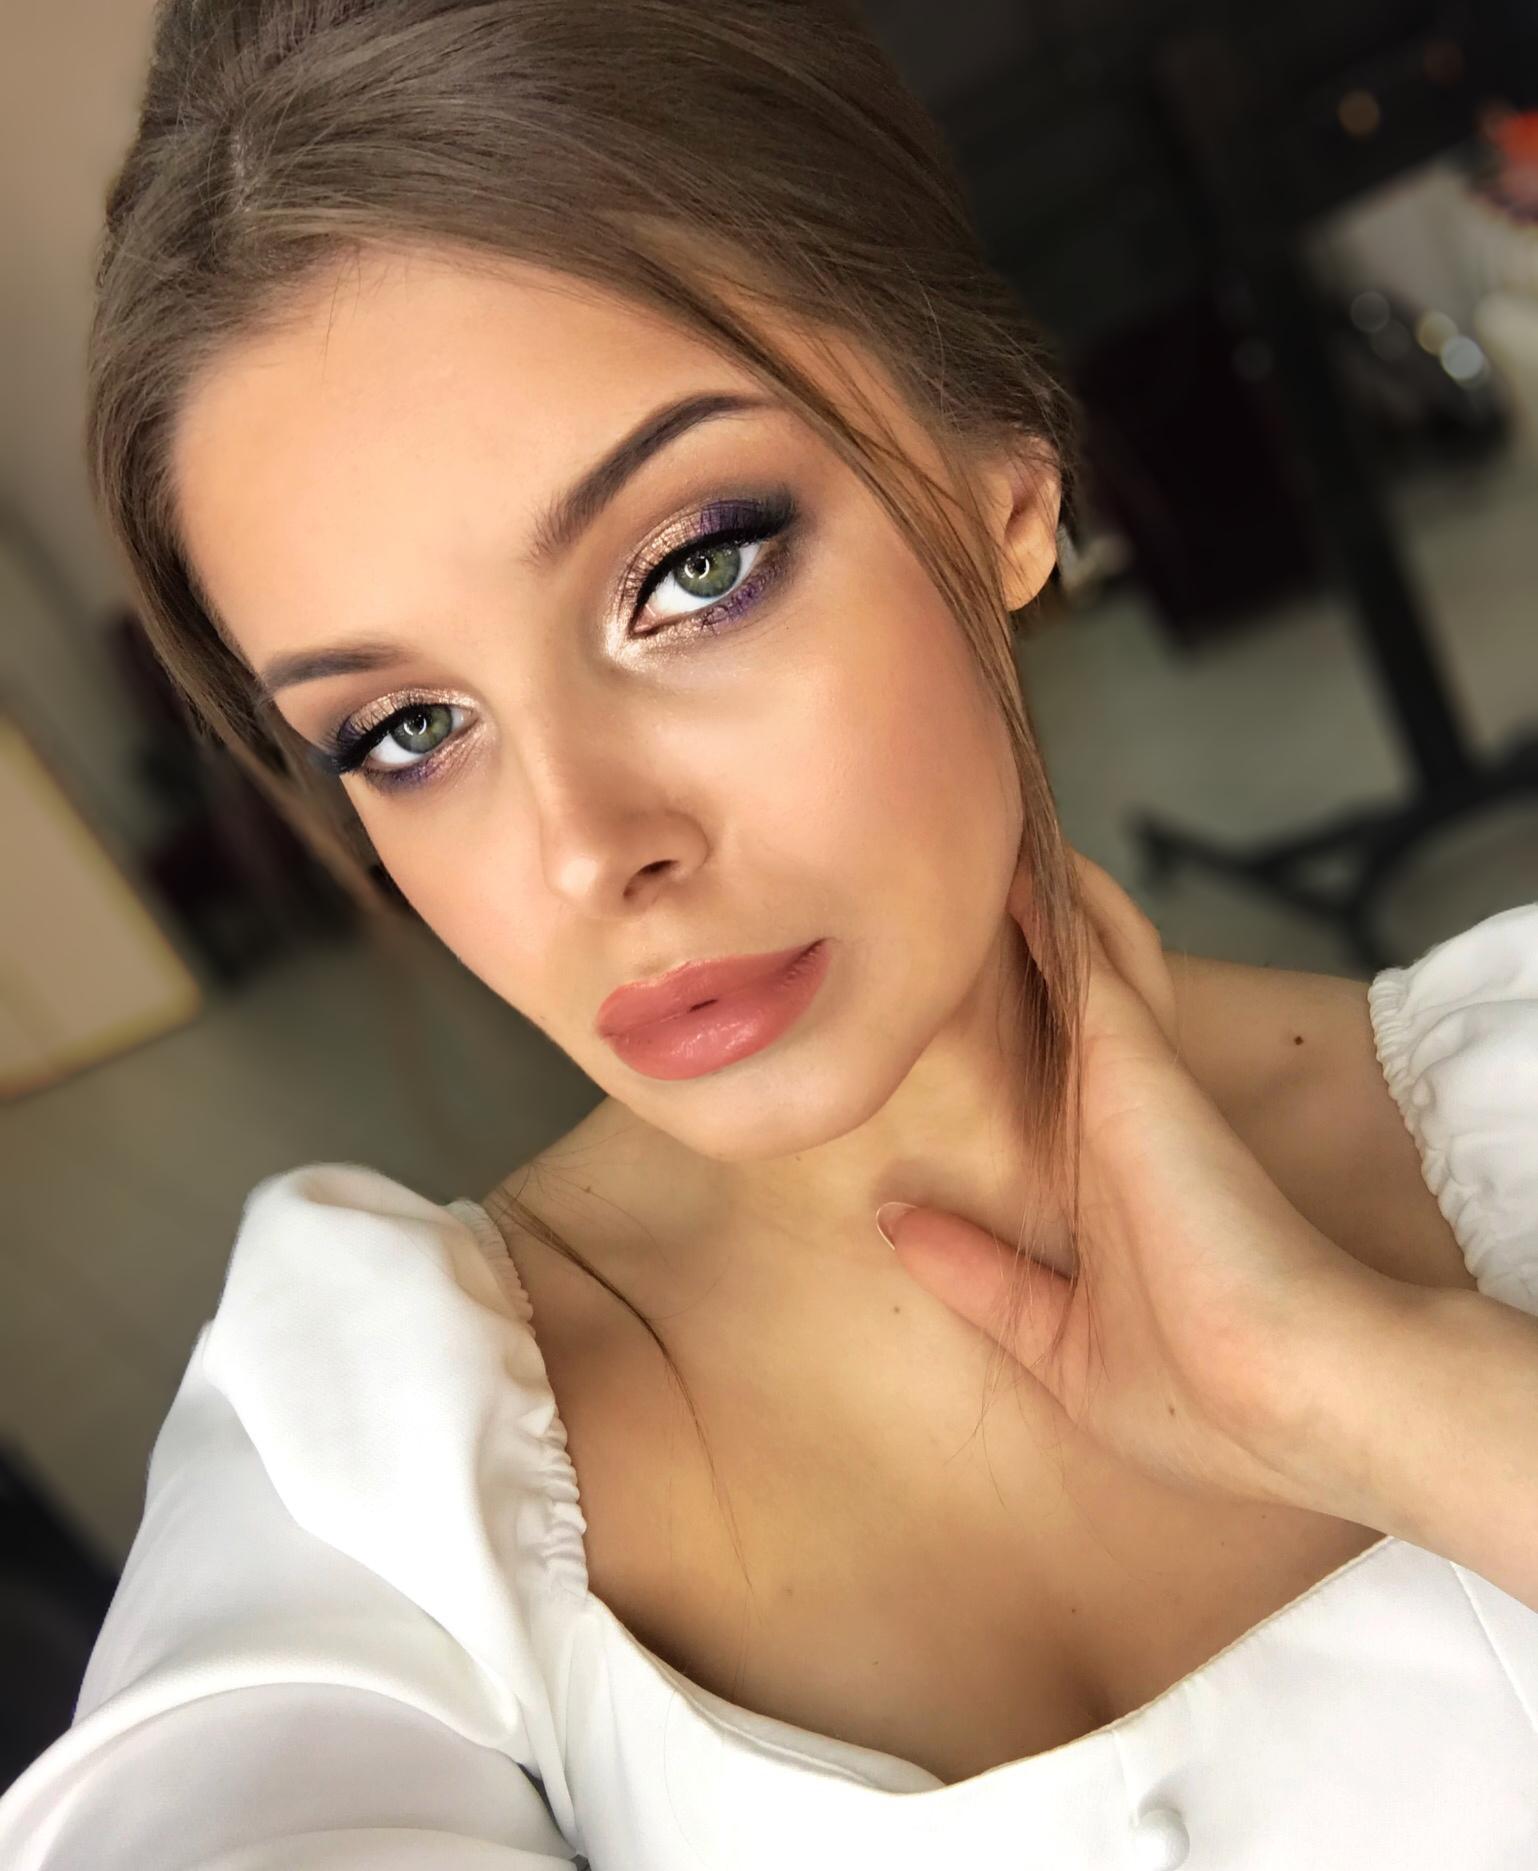 BeautyPlus_20200314224843774_save